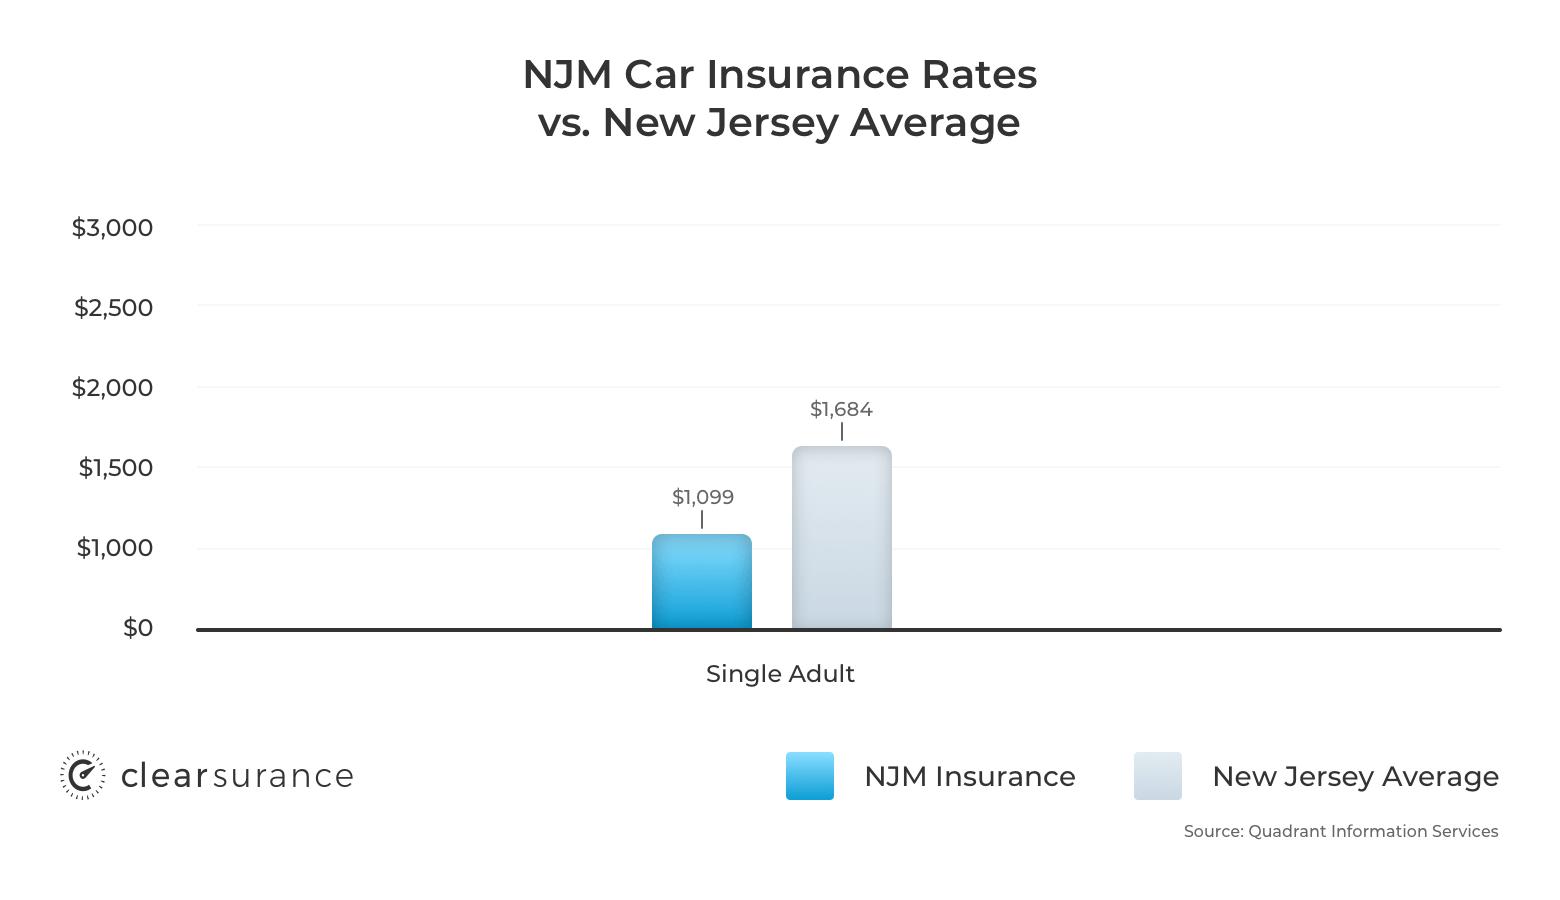 NJM car insurance rates